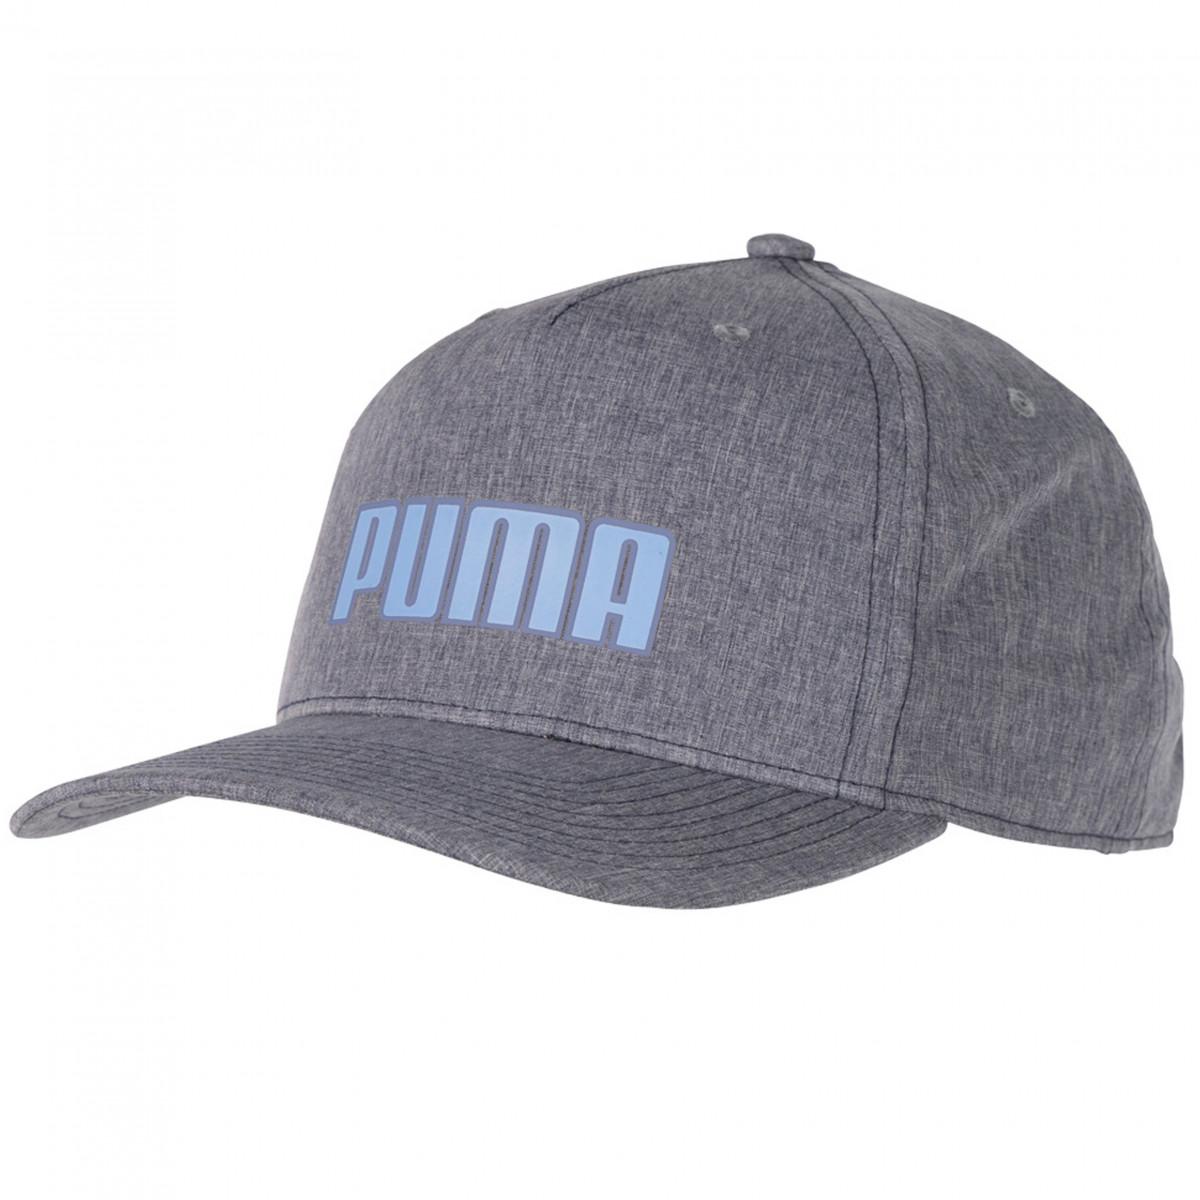 033589a8d81 Puma Golf Mens Go Time Flex Snapback - Golf Headwear - Men - Golf